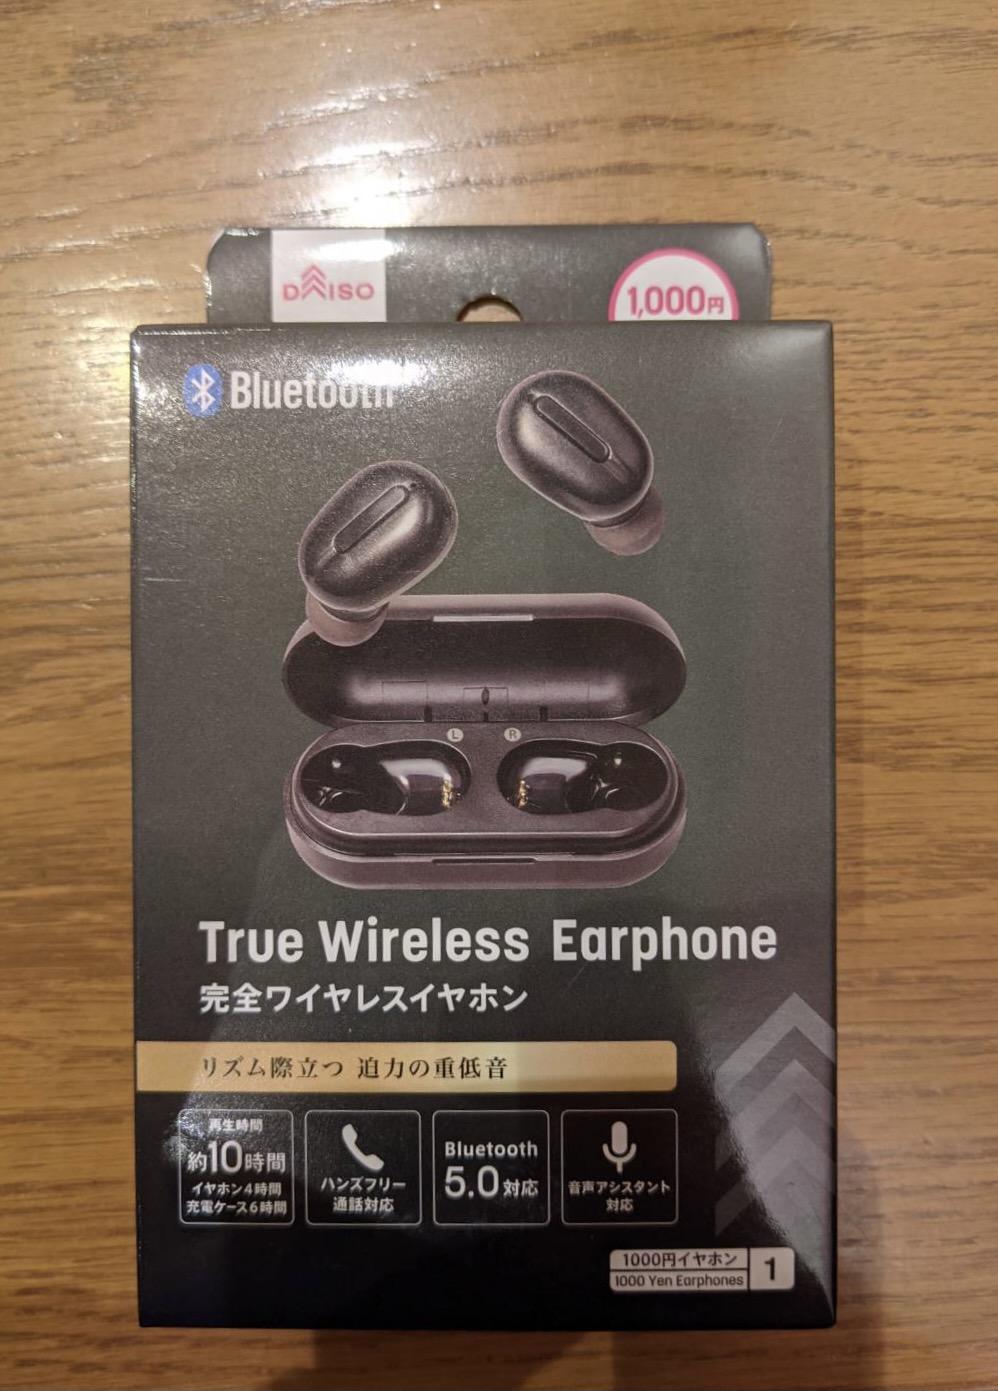 True Wireless Earphoneのイメージ